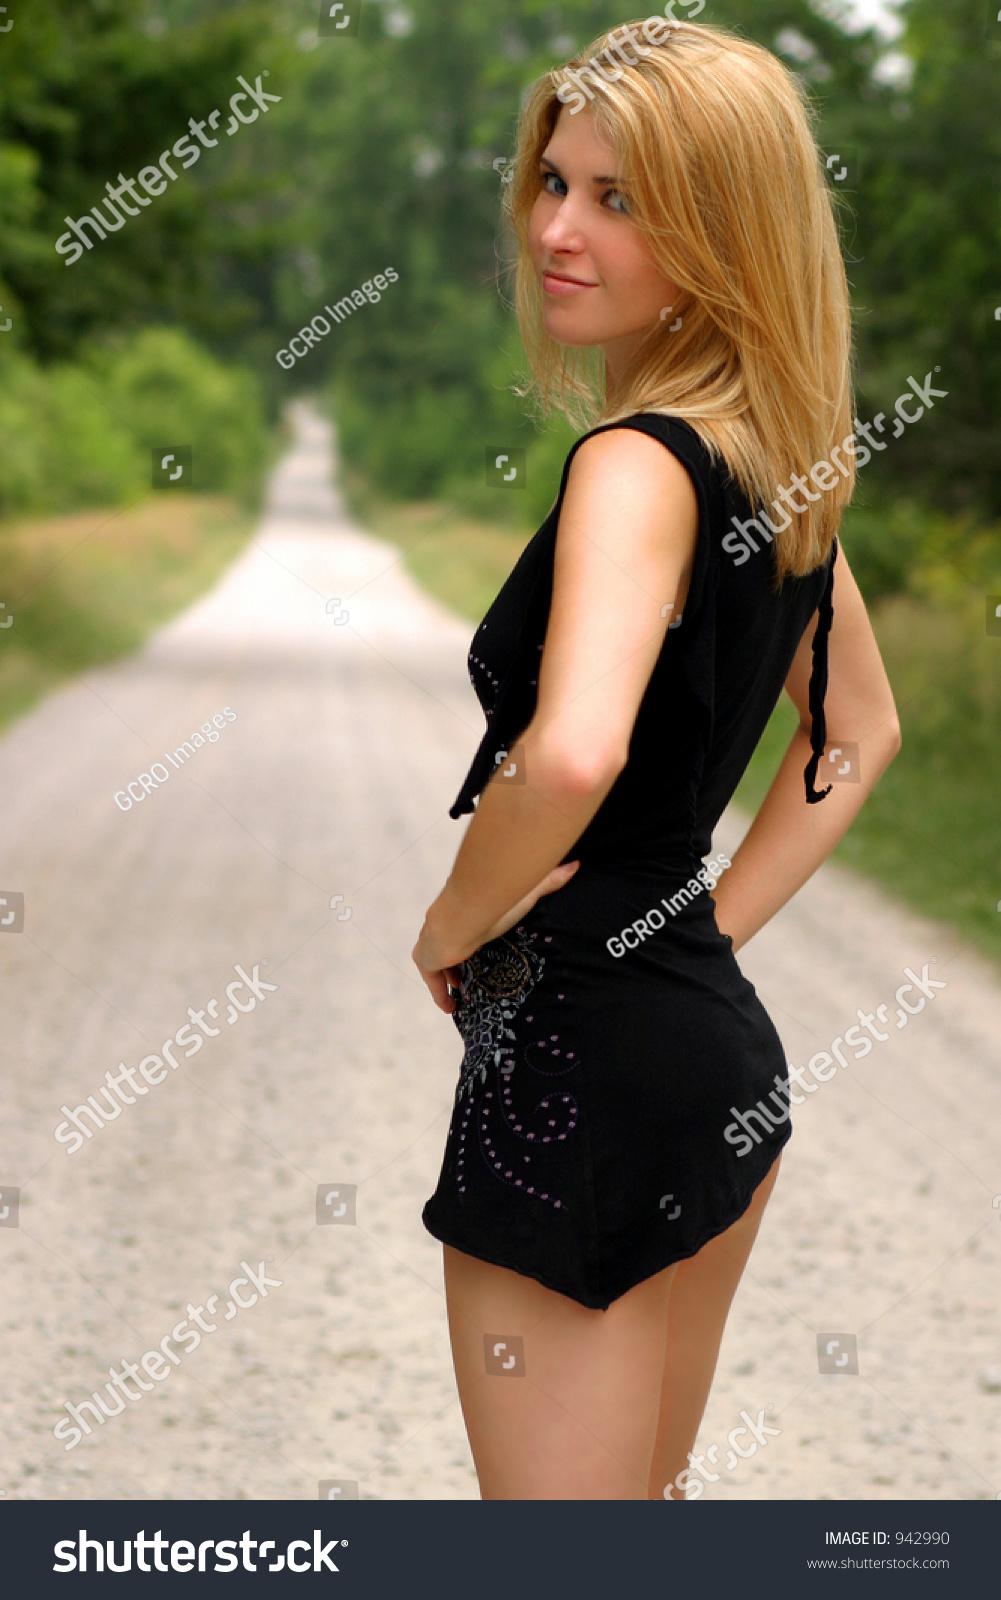 Very Short Dress Ii Stock Photo 942990 - Shutterstock